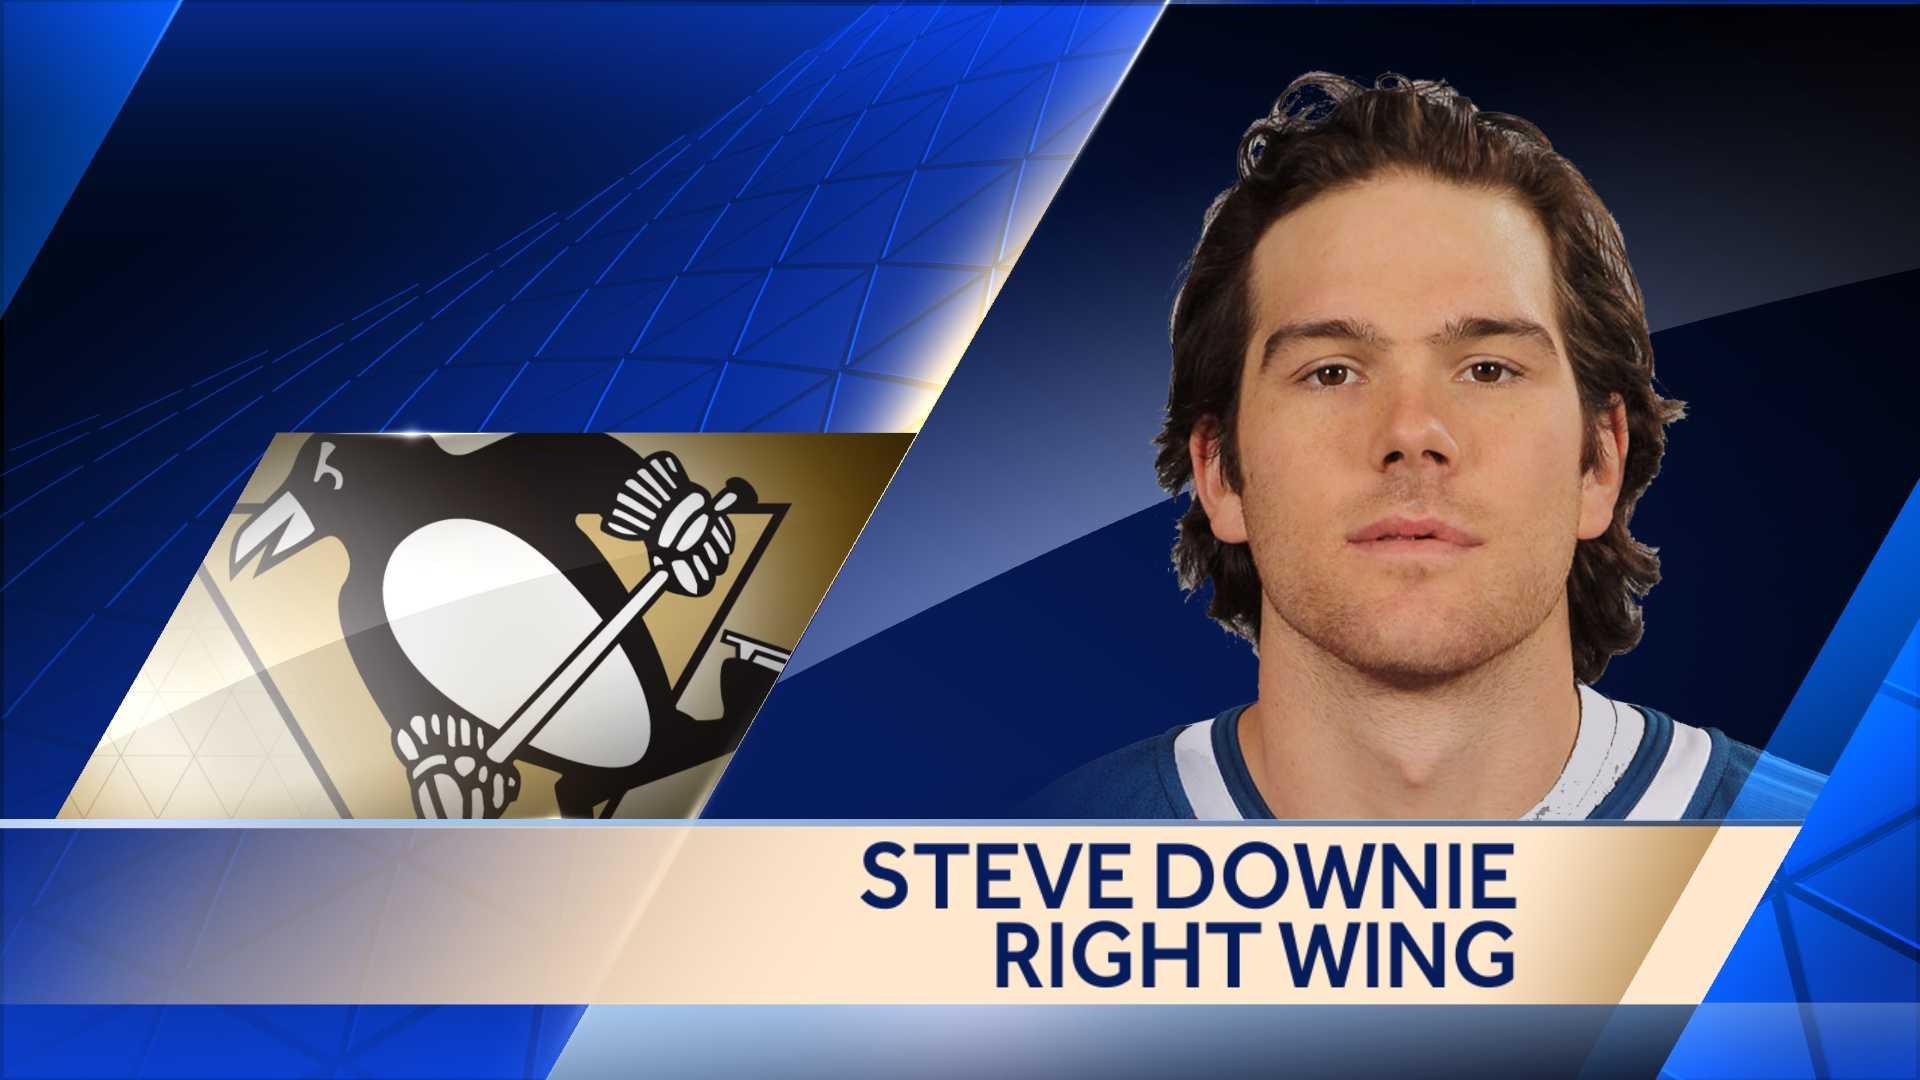 Steve Downie